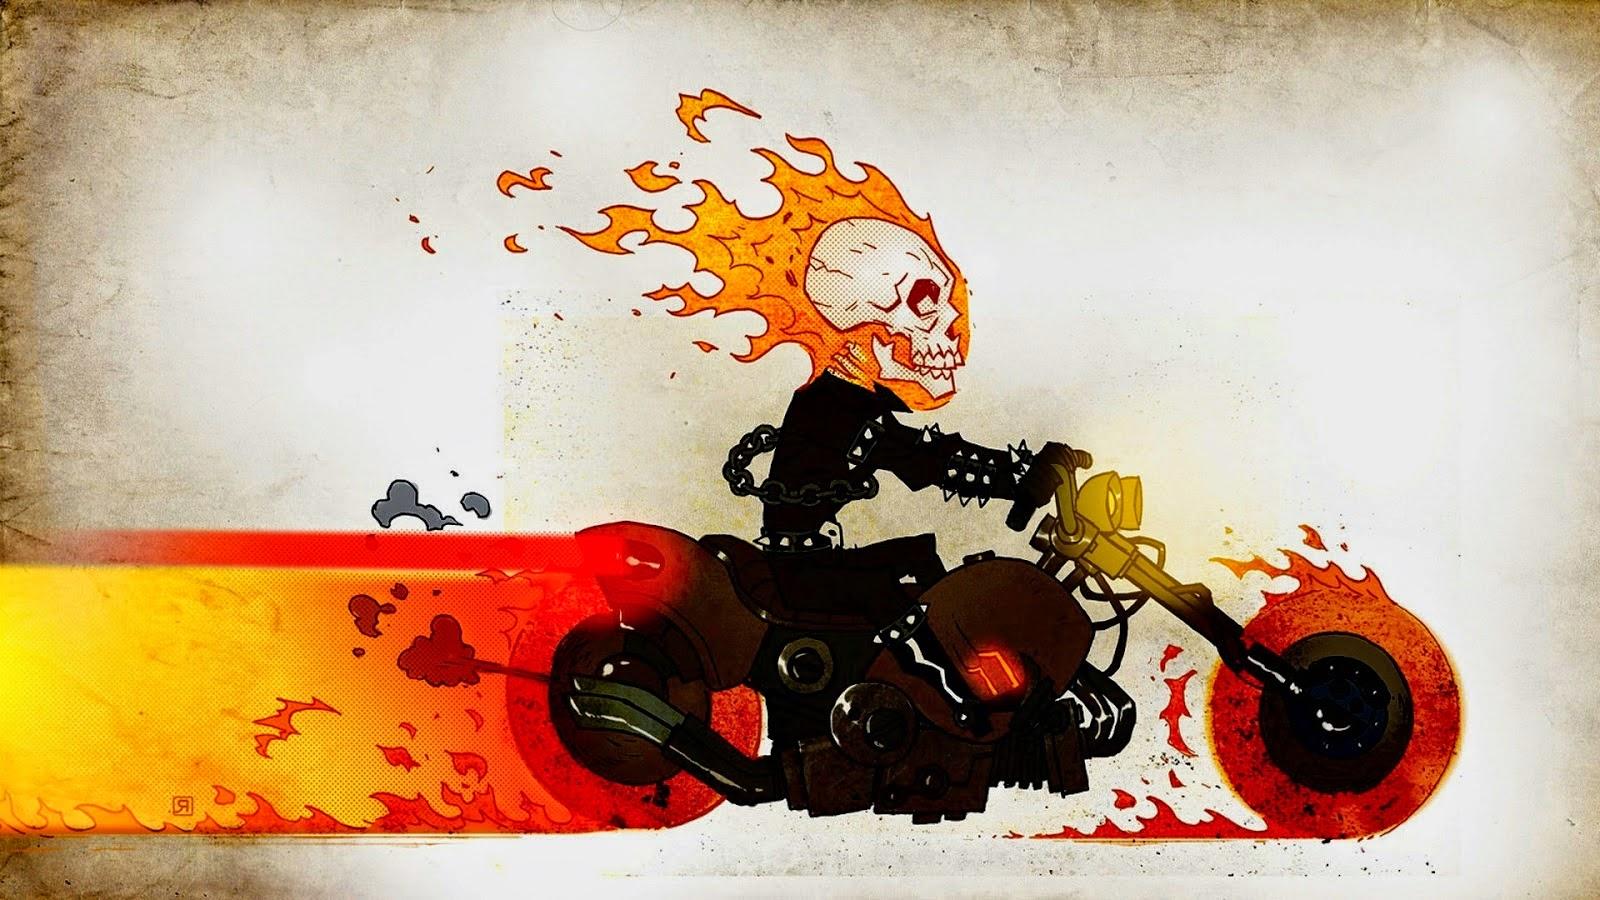 ghost rider hd wallpapers ghost rider hd wallpapers ghost rider hd 1600x900